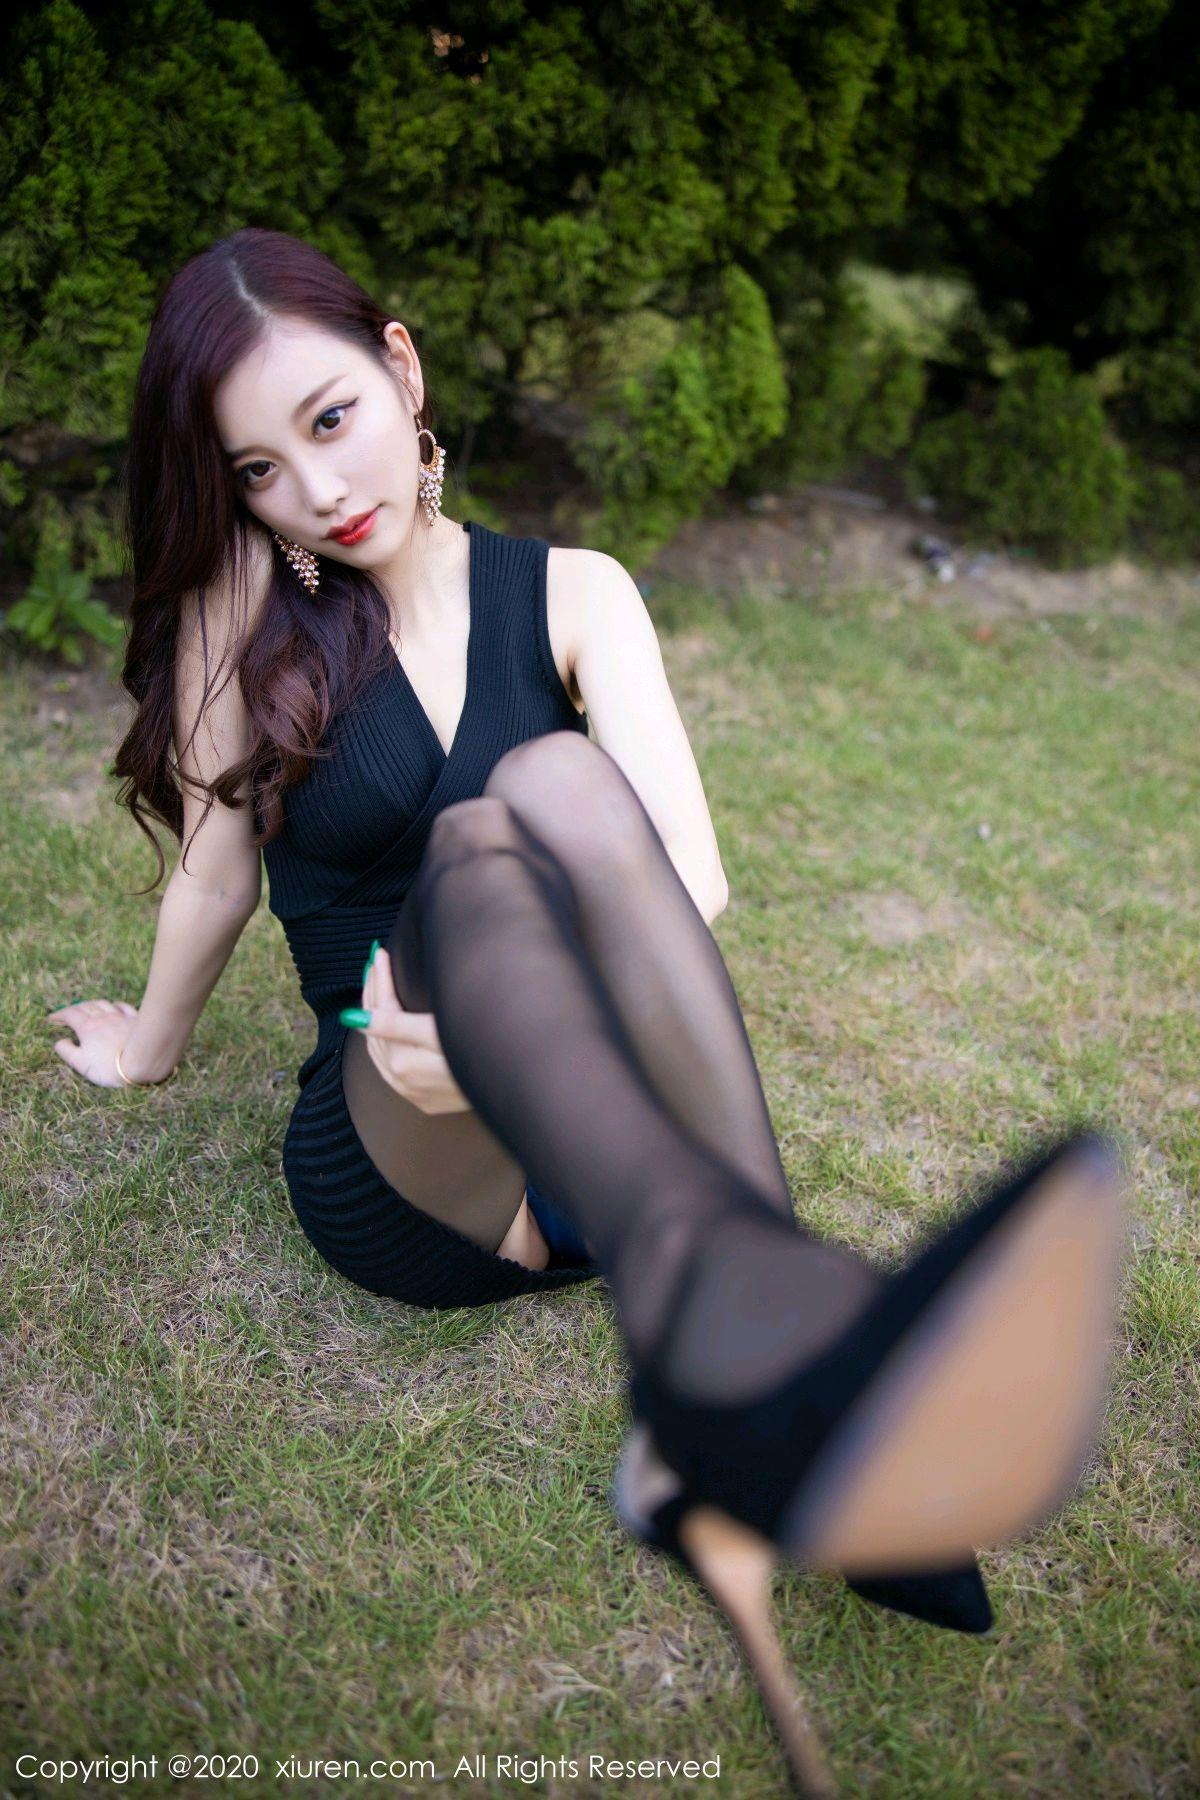 [XiuRen] Vol.2648 Yang Chen Chen 34P, Black Silk, Outdoor, Xiuren, Yang Chen Chen